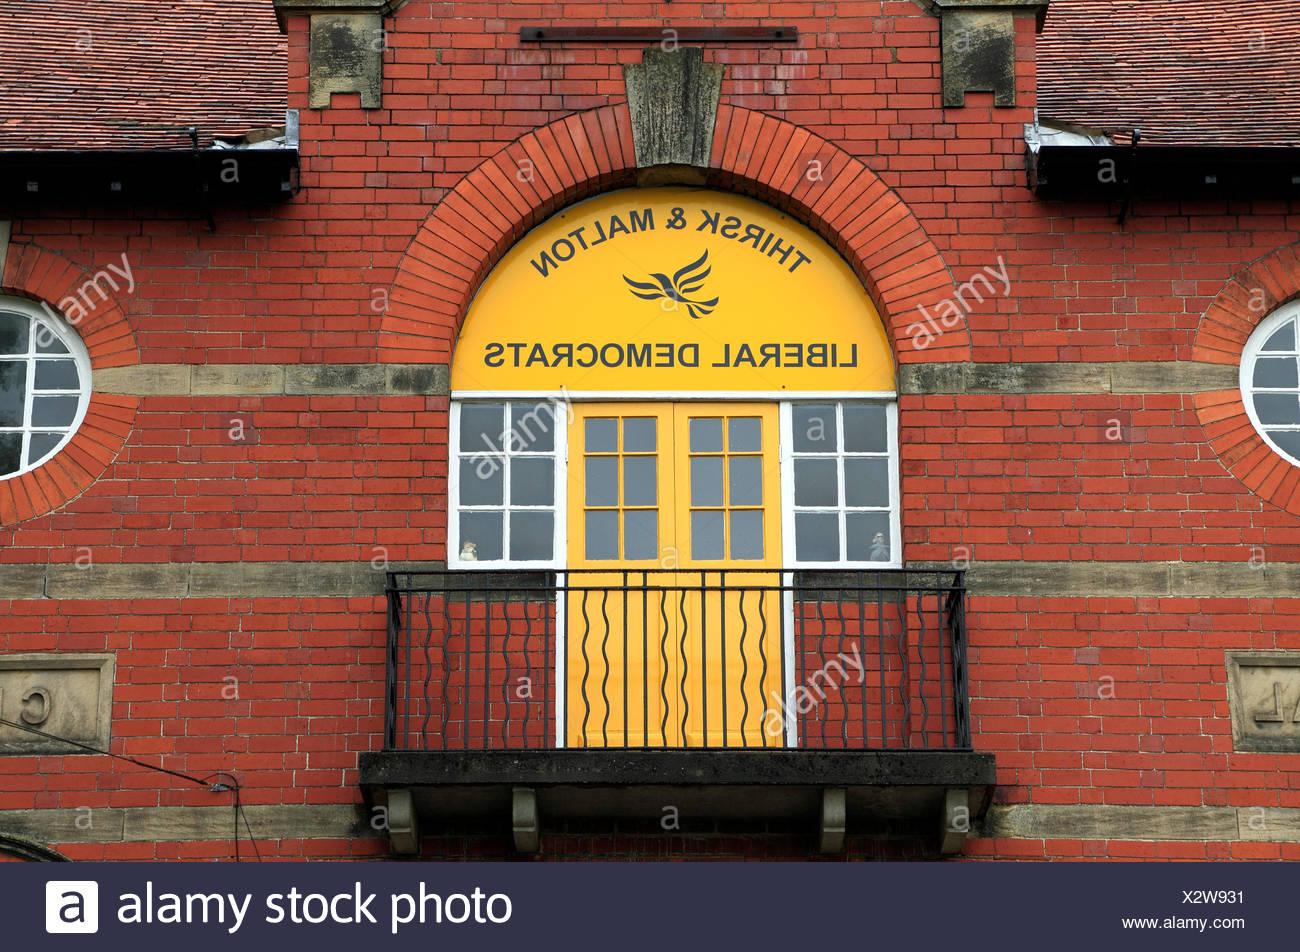 Liberal Democrats, local Thirsk & Malton party HQ, Pickering, Yorkshire England UK Politics political parties Democratic - Stock Image